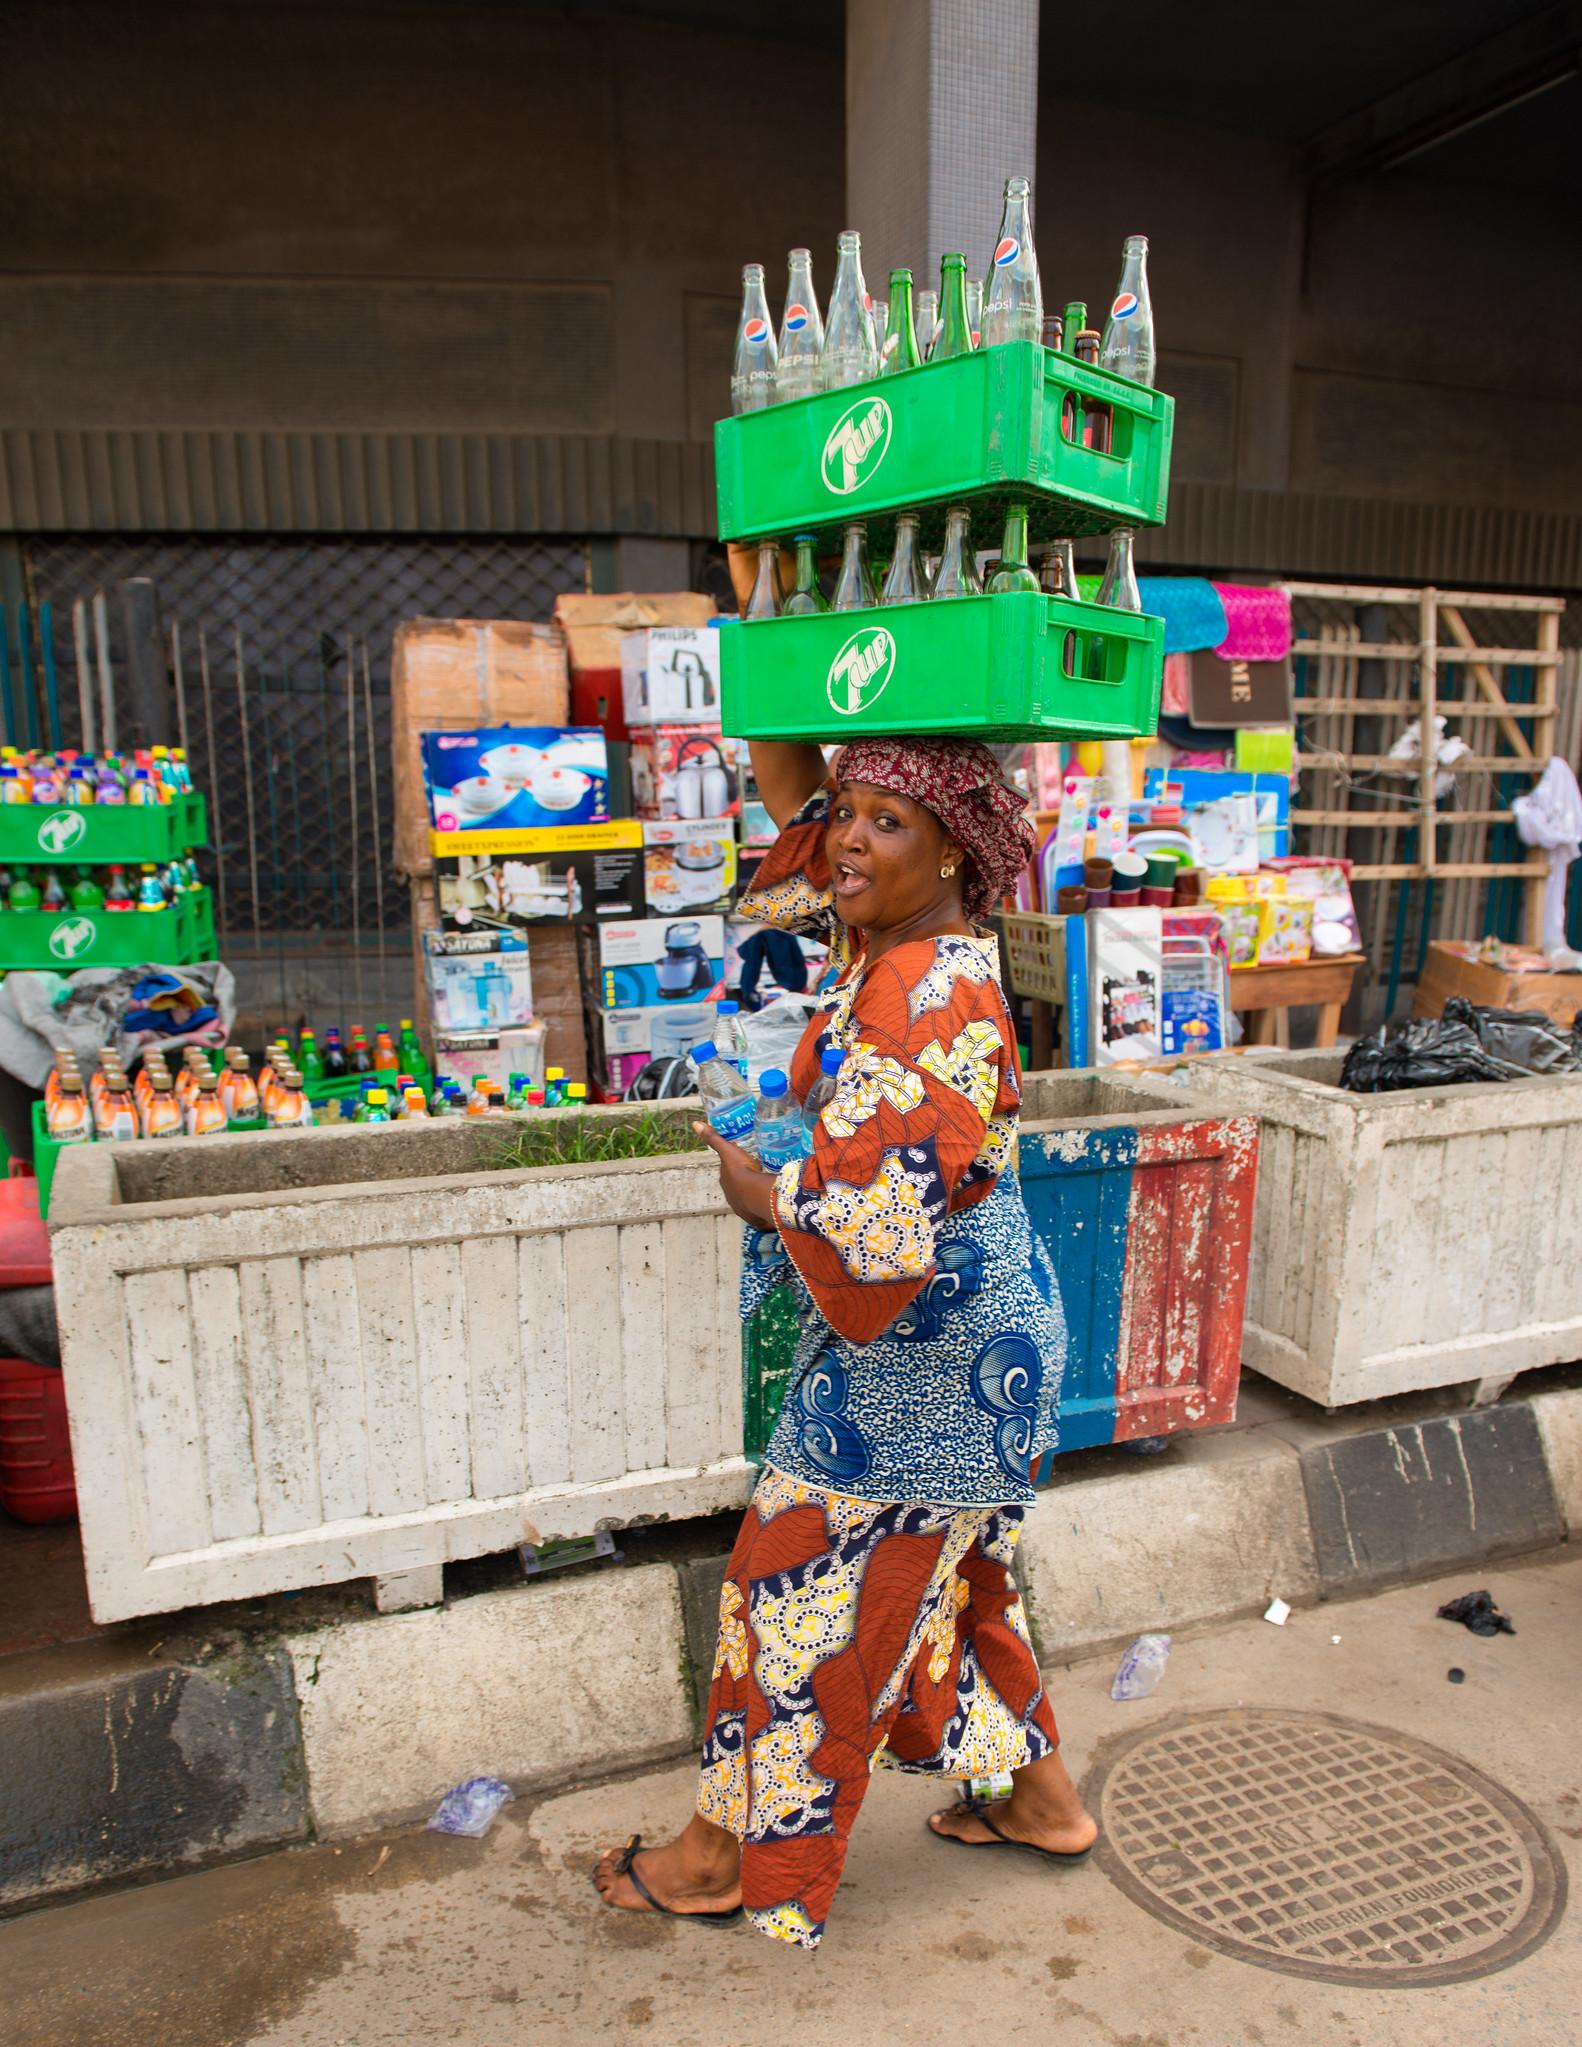 Bottle Service in Lagos